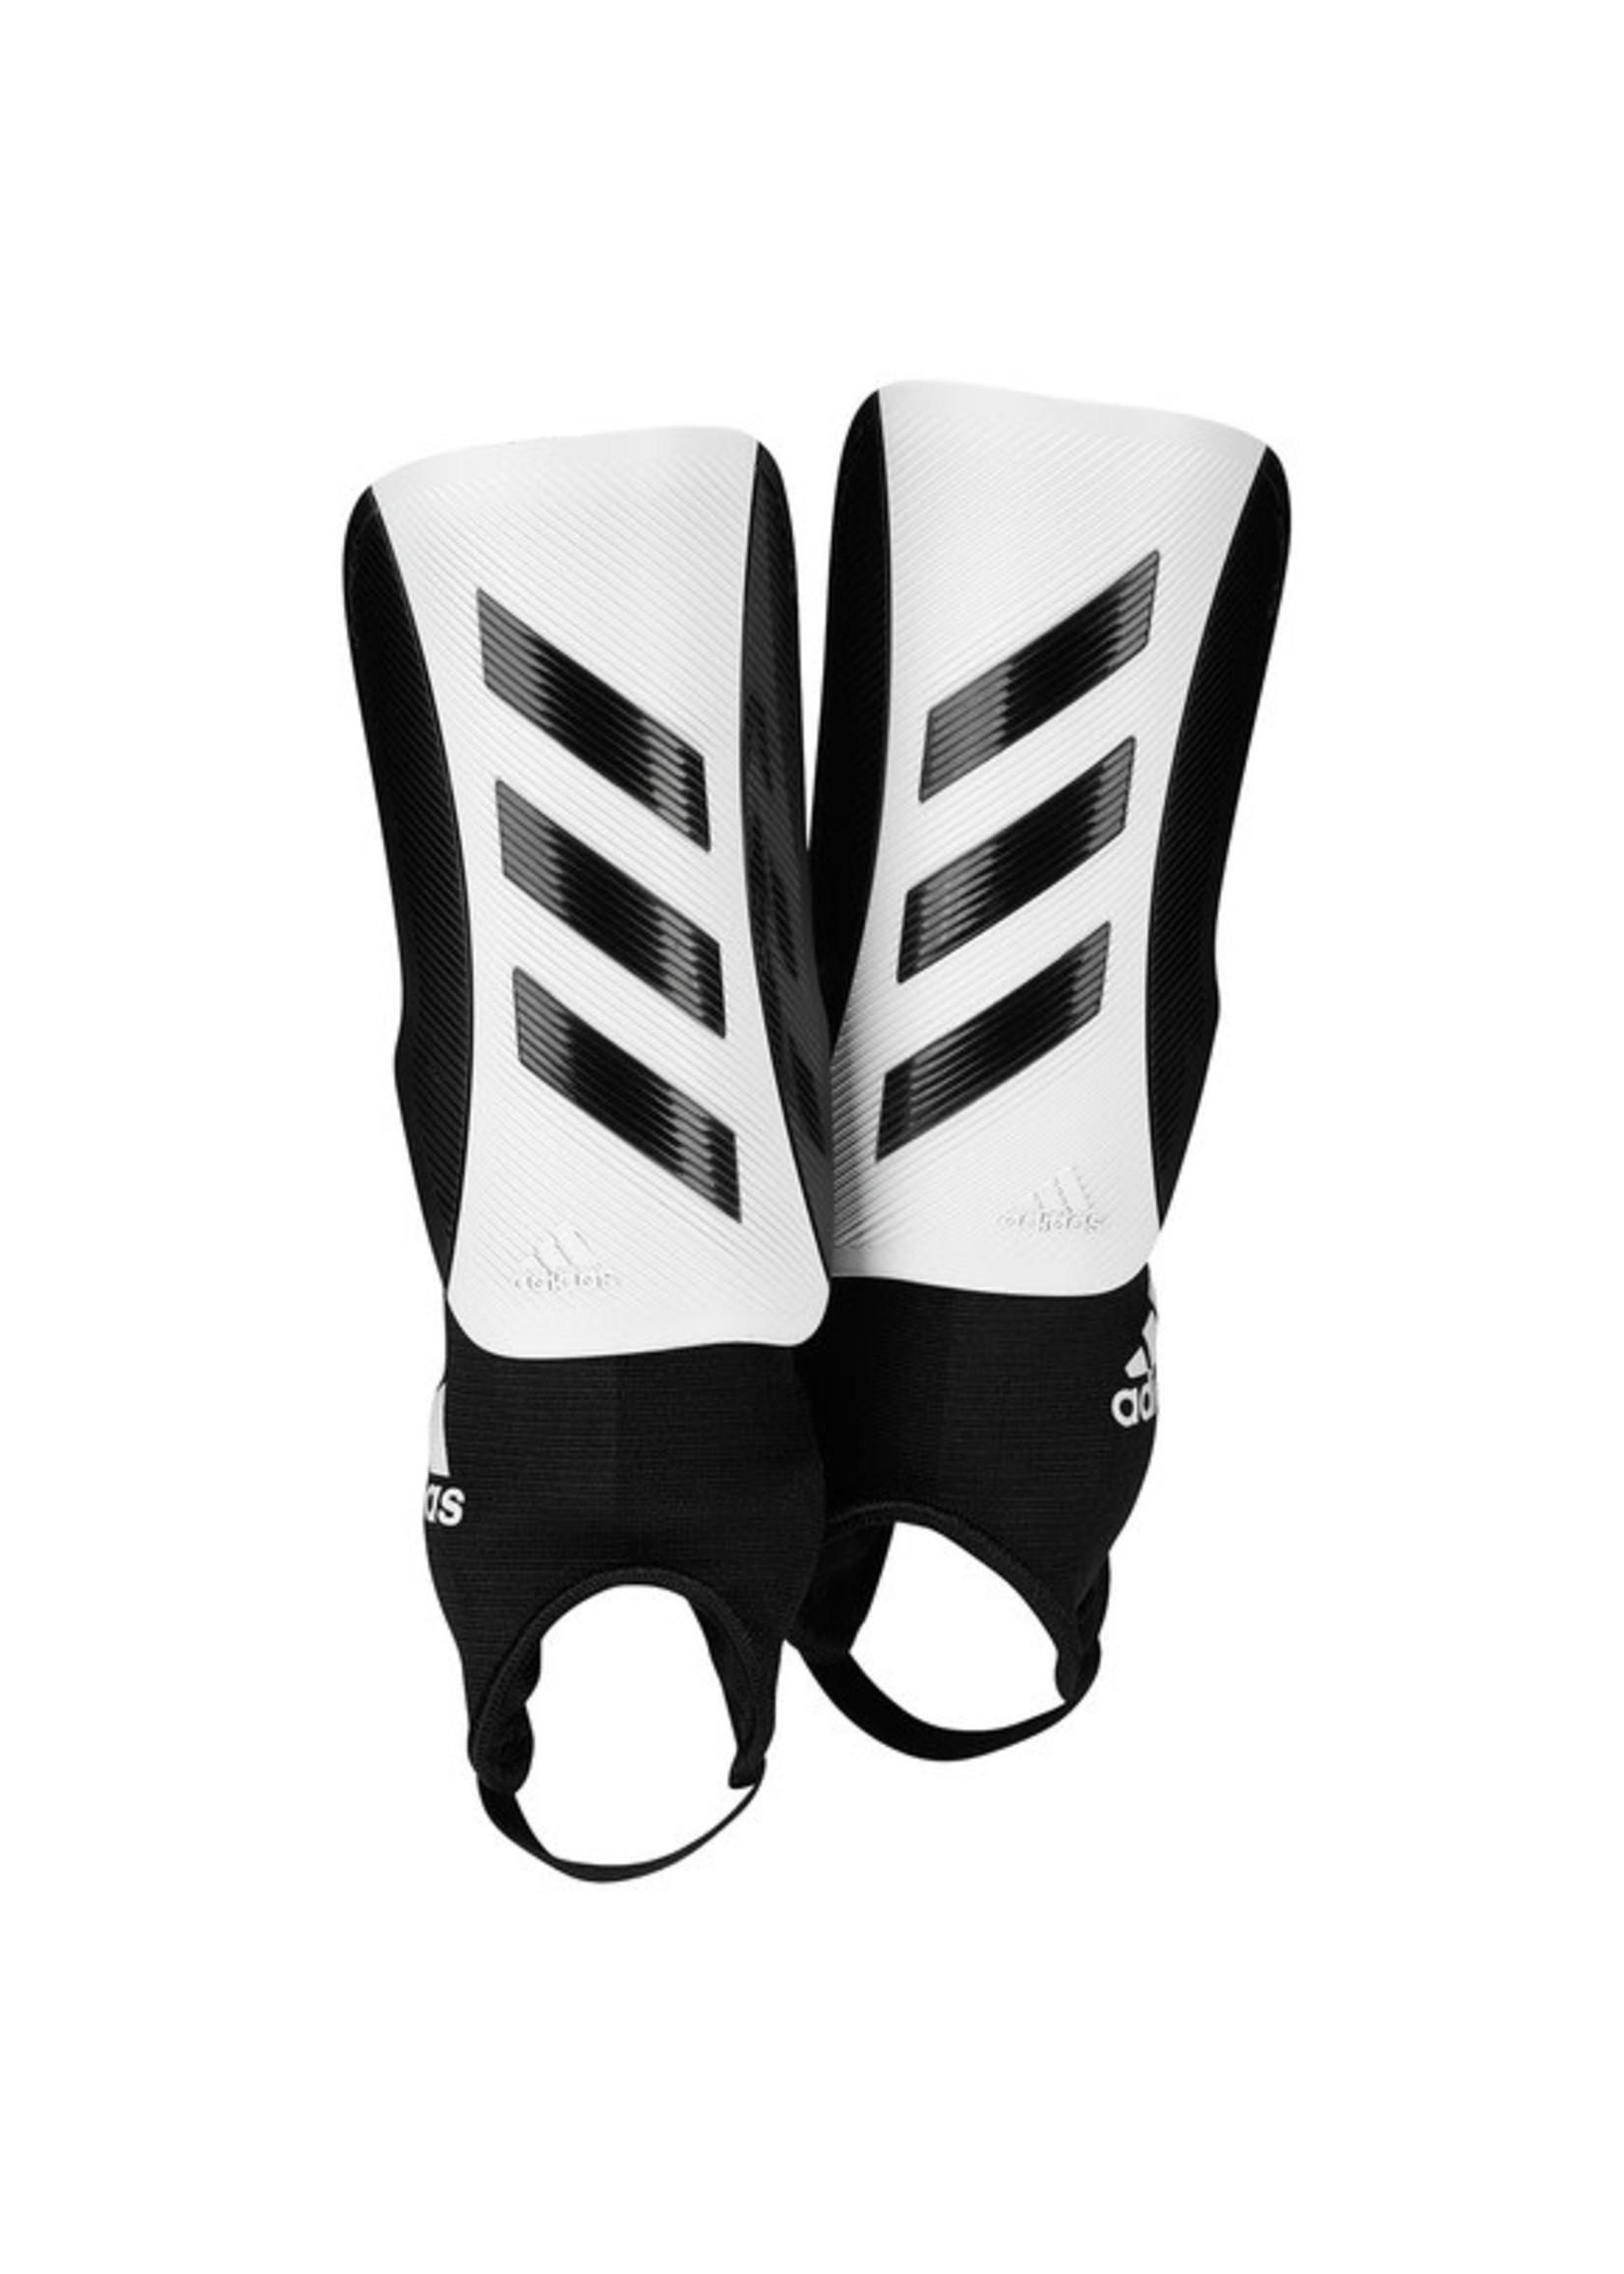 Adidas TIRO SG MATCH